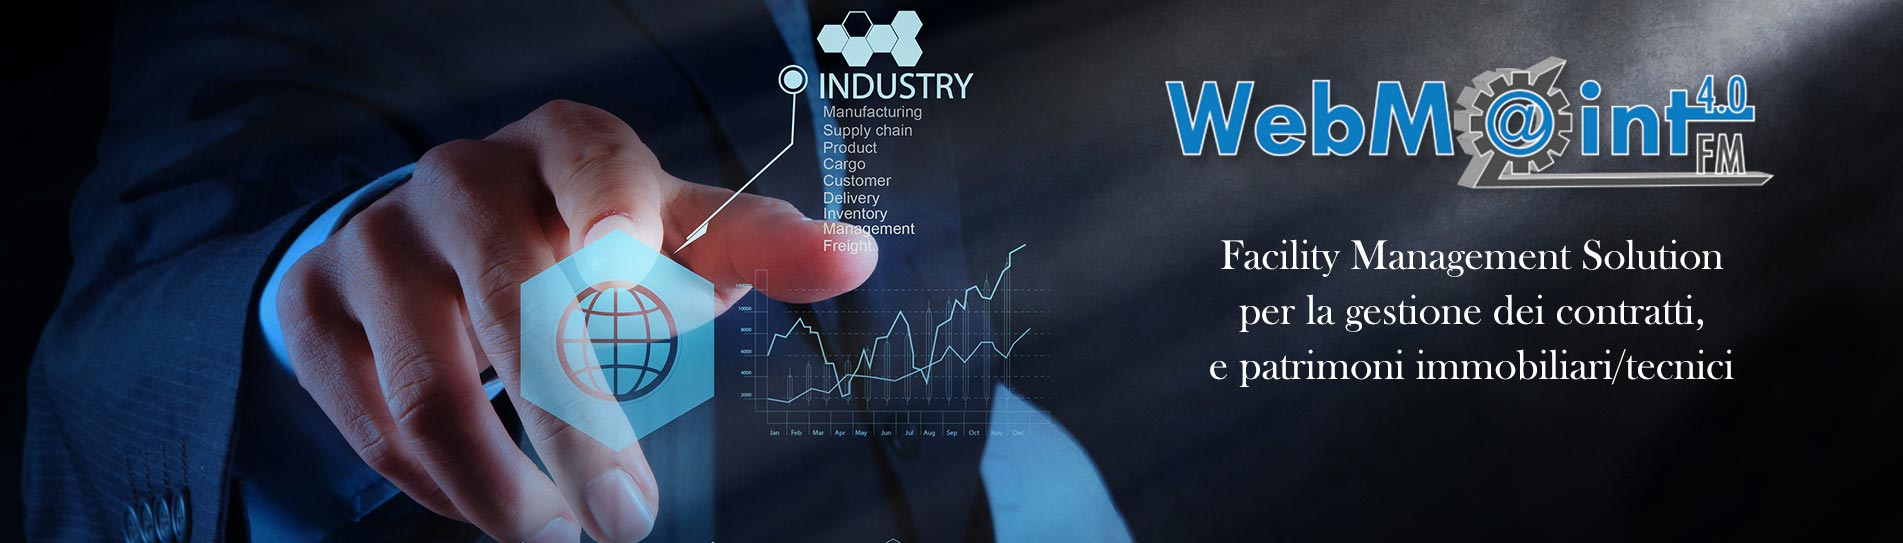 WebMaint FM 4.0